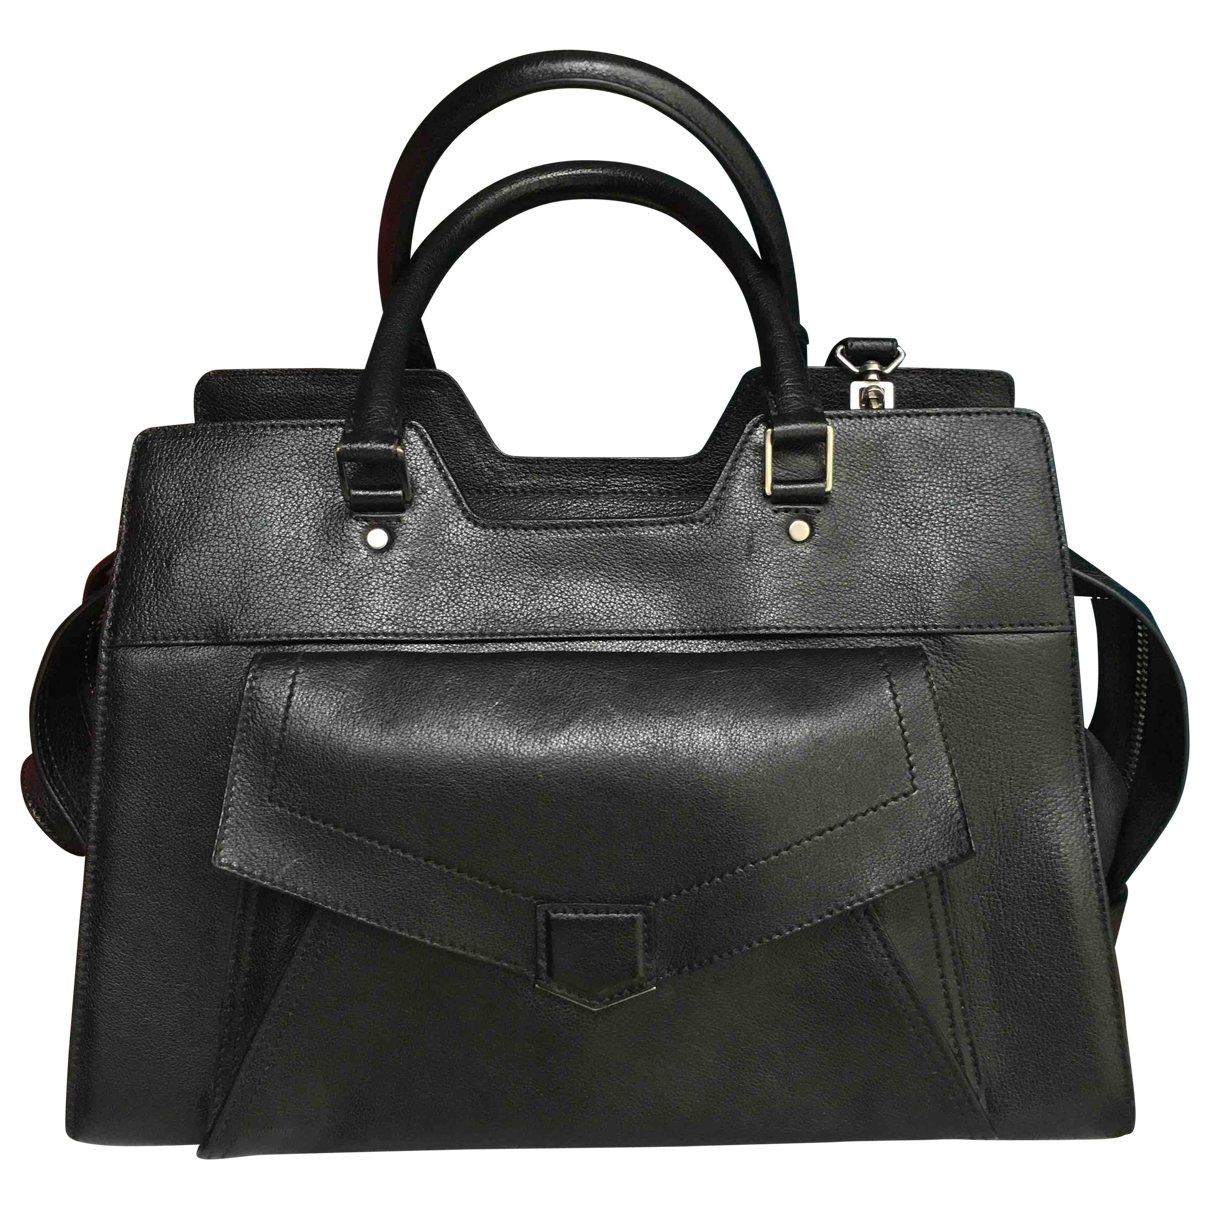 Proenza Schouler Frame Handtasche in  Schwarz Leder